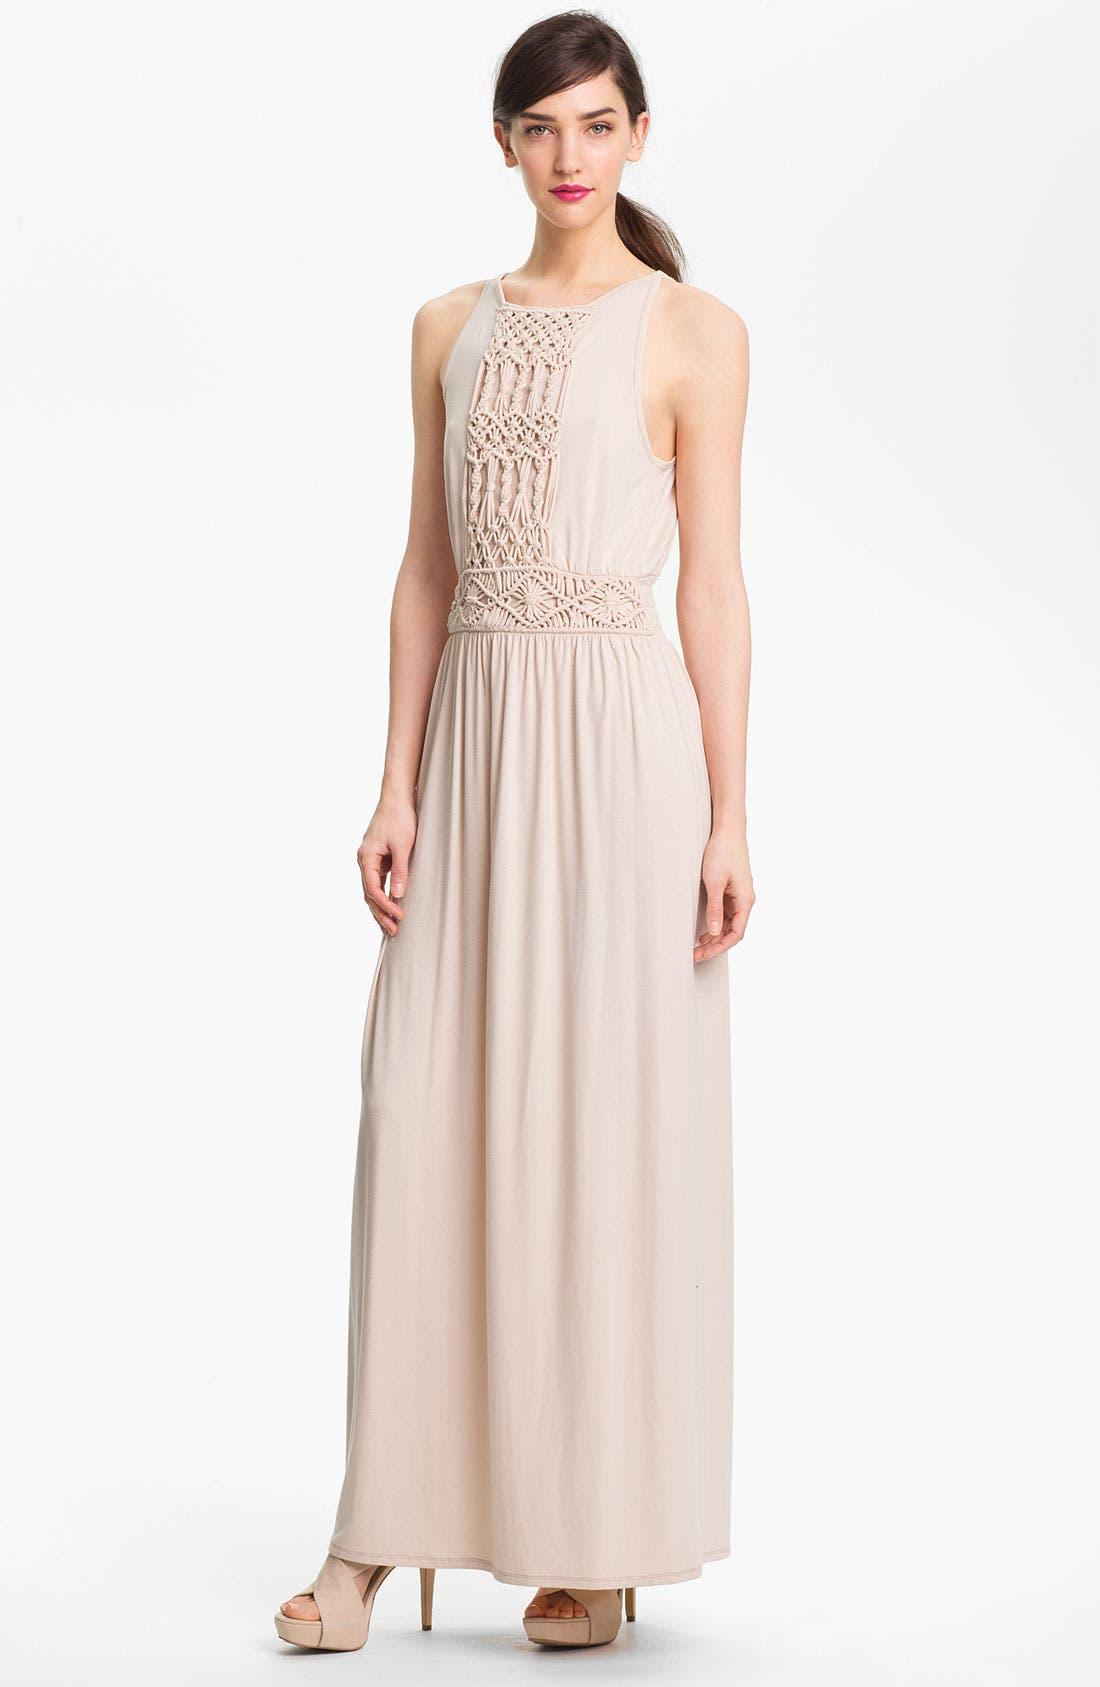 Alternate Image 1 Selected - Trina Turk 'Deidi' Stretch Maxi Dress